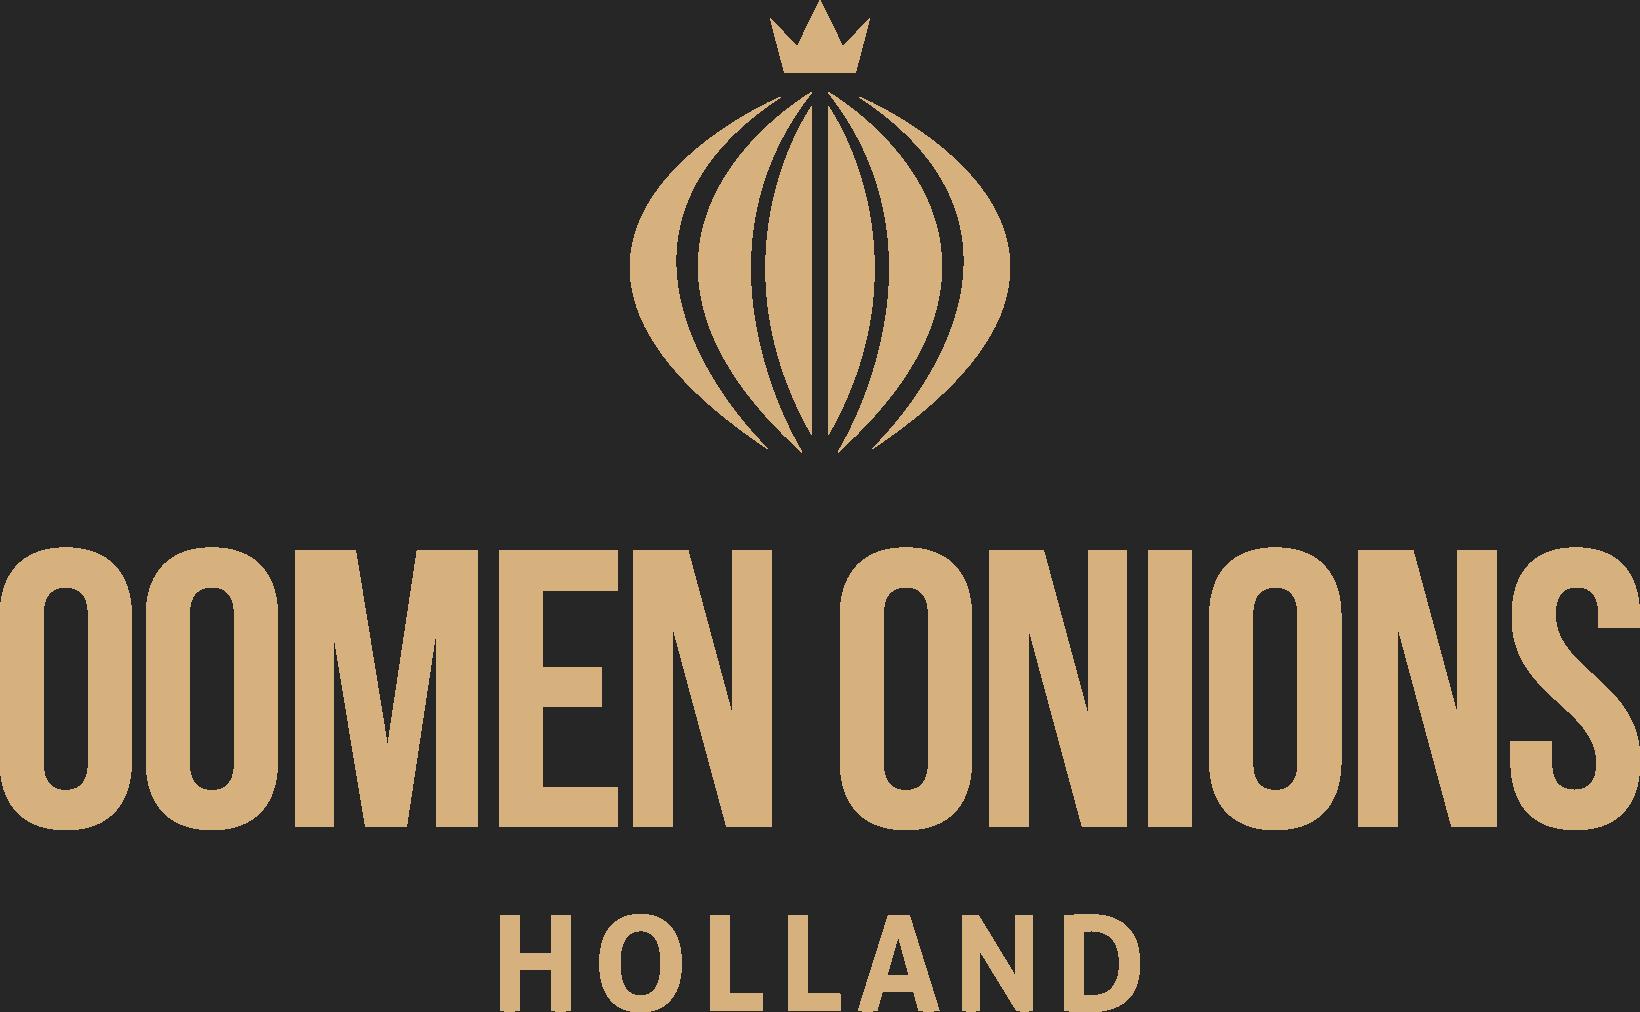 Oomen-Onions-logo-goud-groot@2x